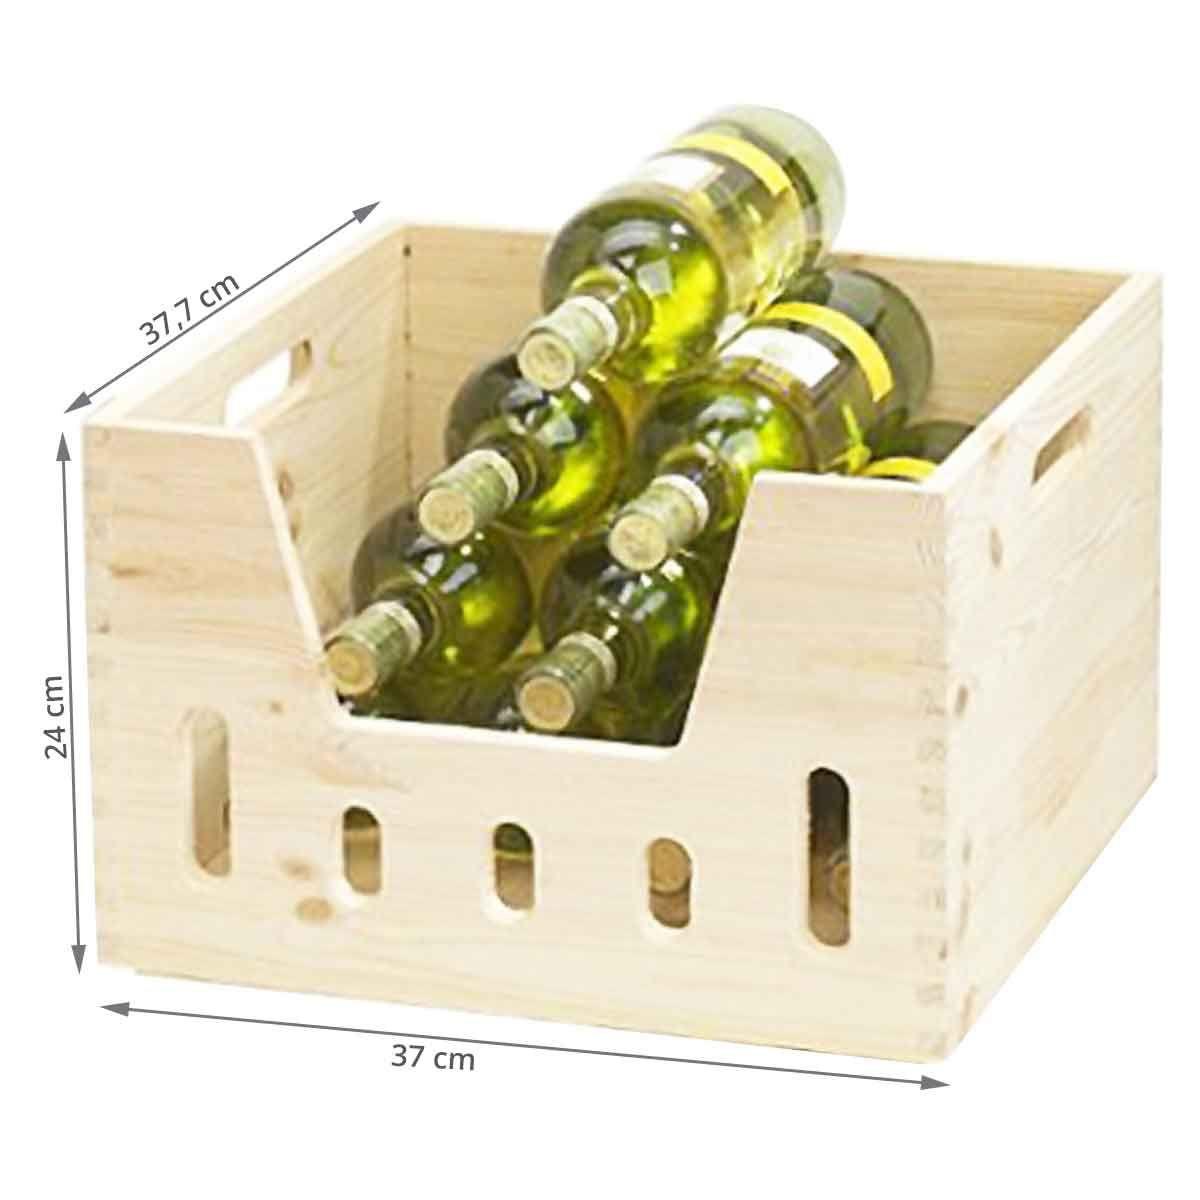 caisse empilable en bois rangement bouteilles. Black Bedroom Furniture Sets. Home Design Ideas